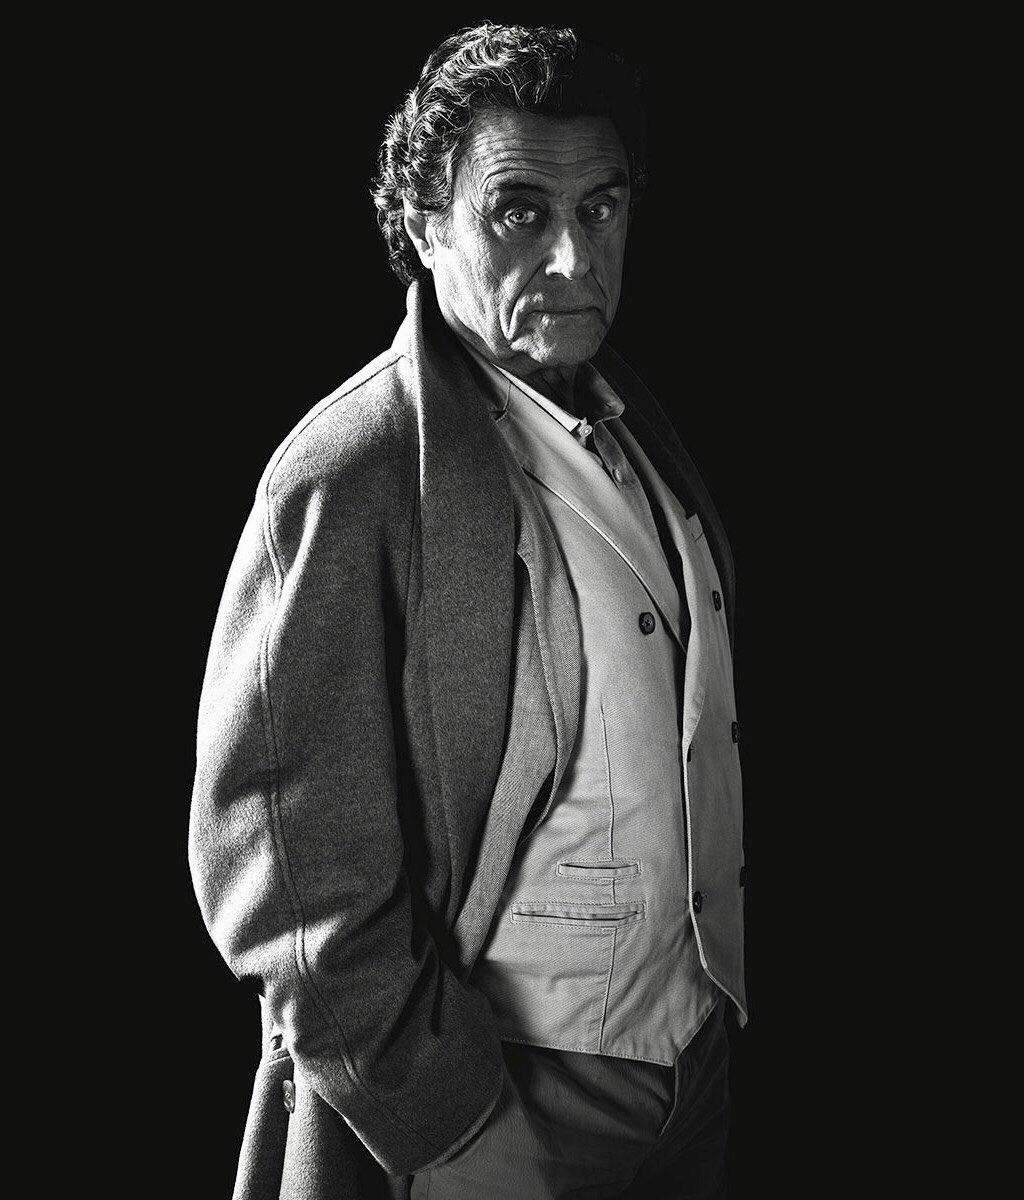 foto Ian McShane (born 1942)